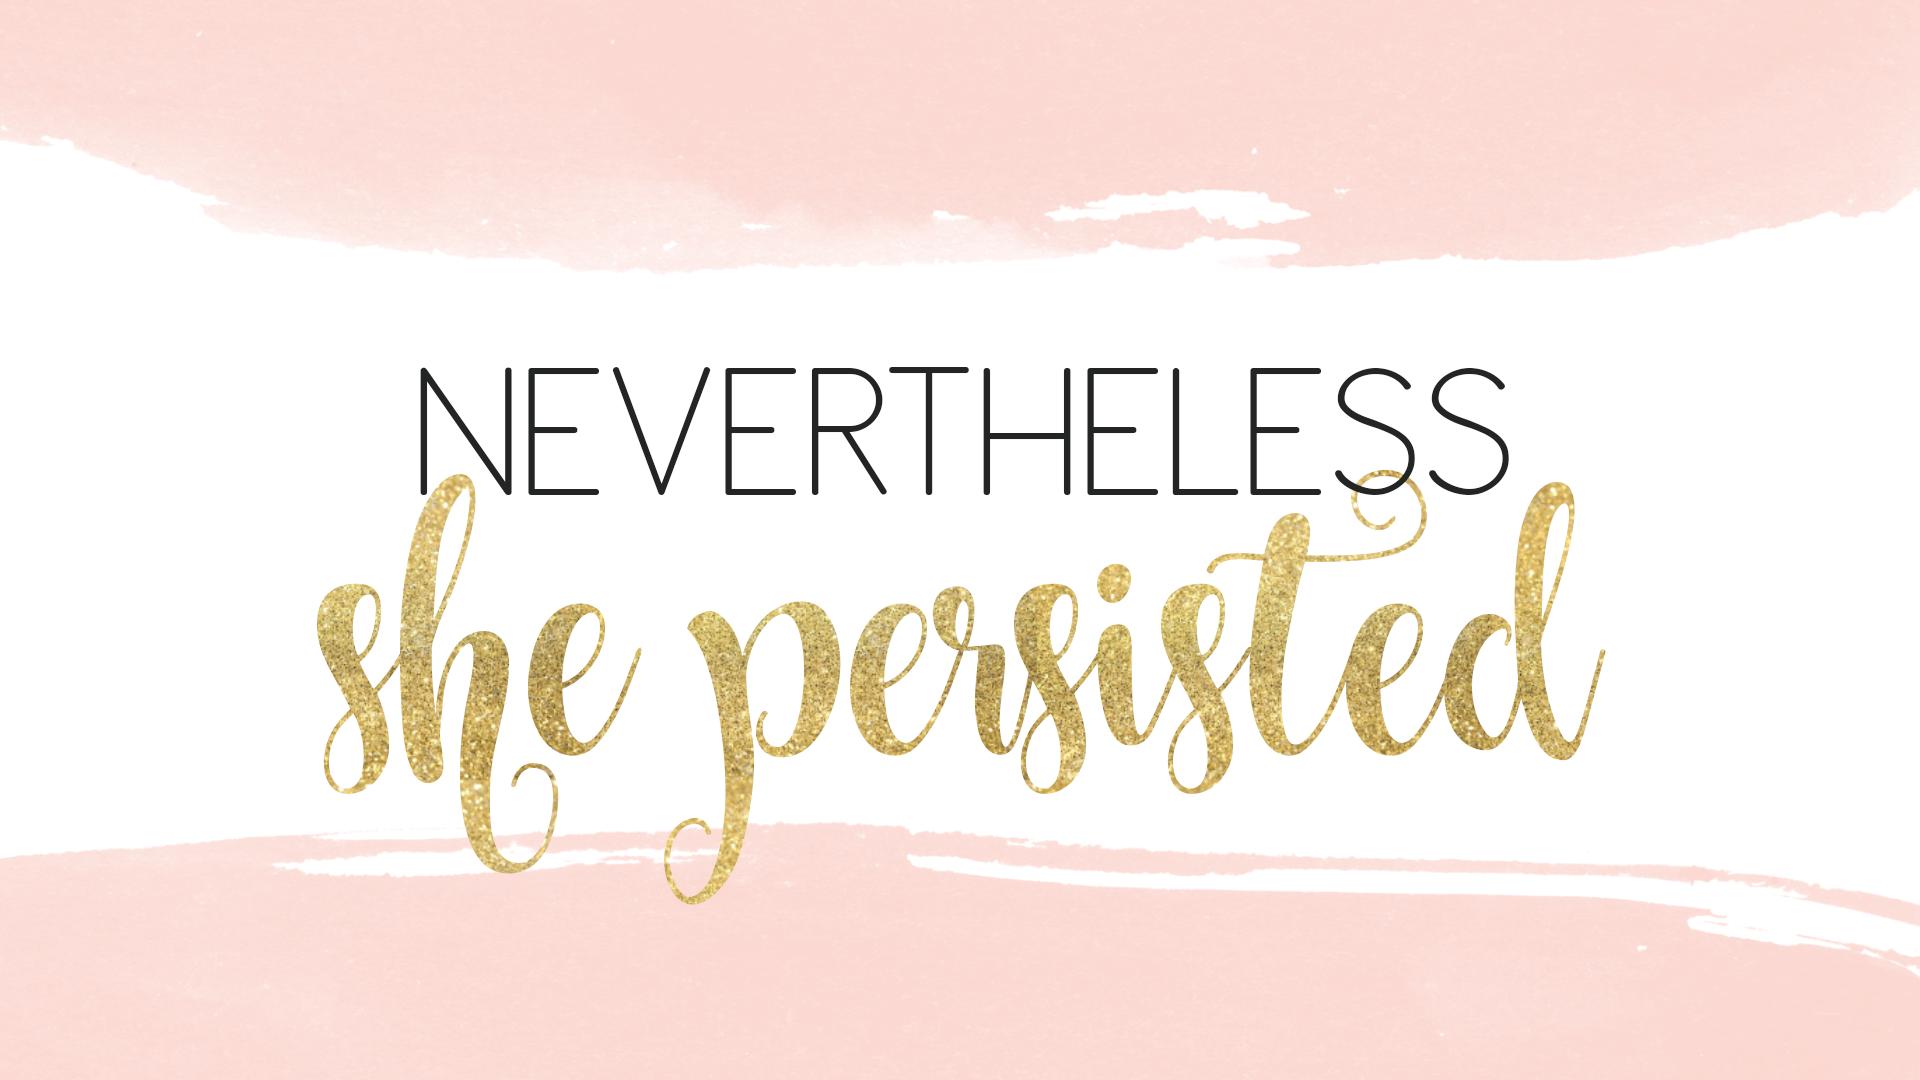 Desktop Motivational Quotes For Girls Wallpapers - Wallpaper Cave